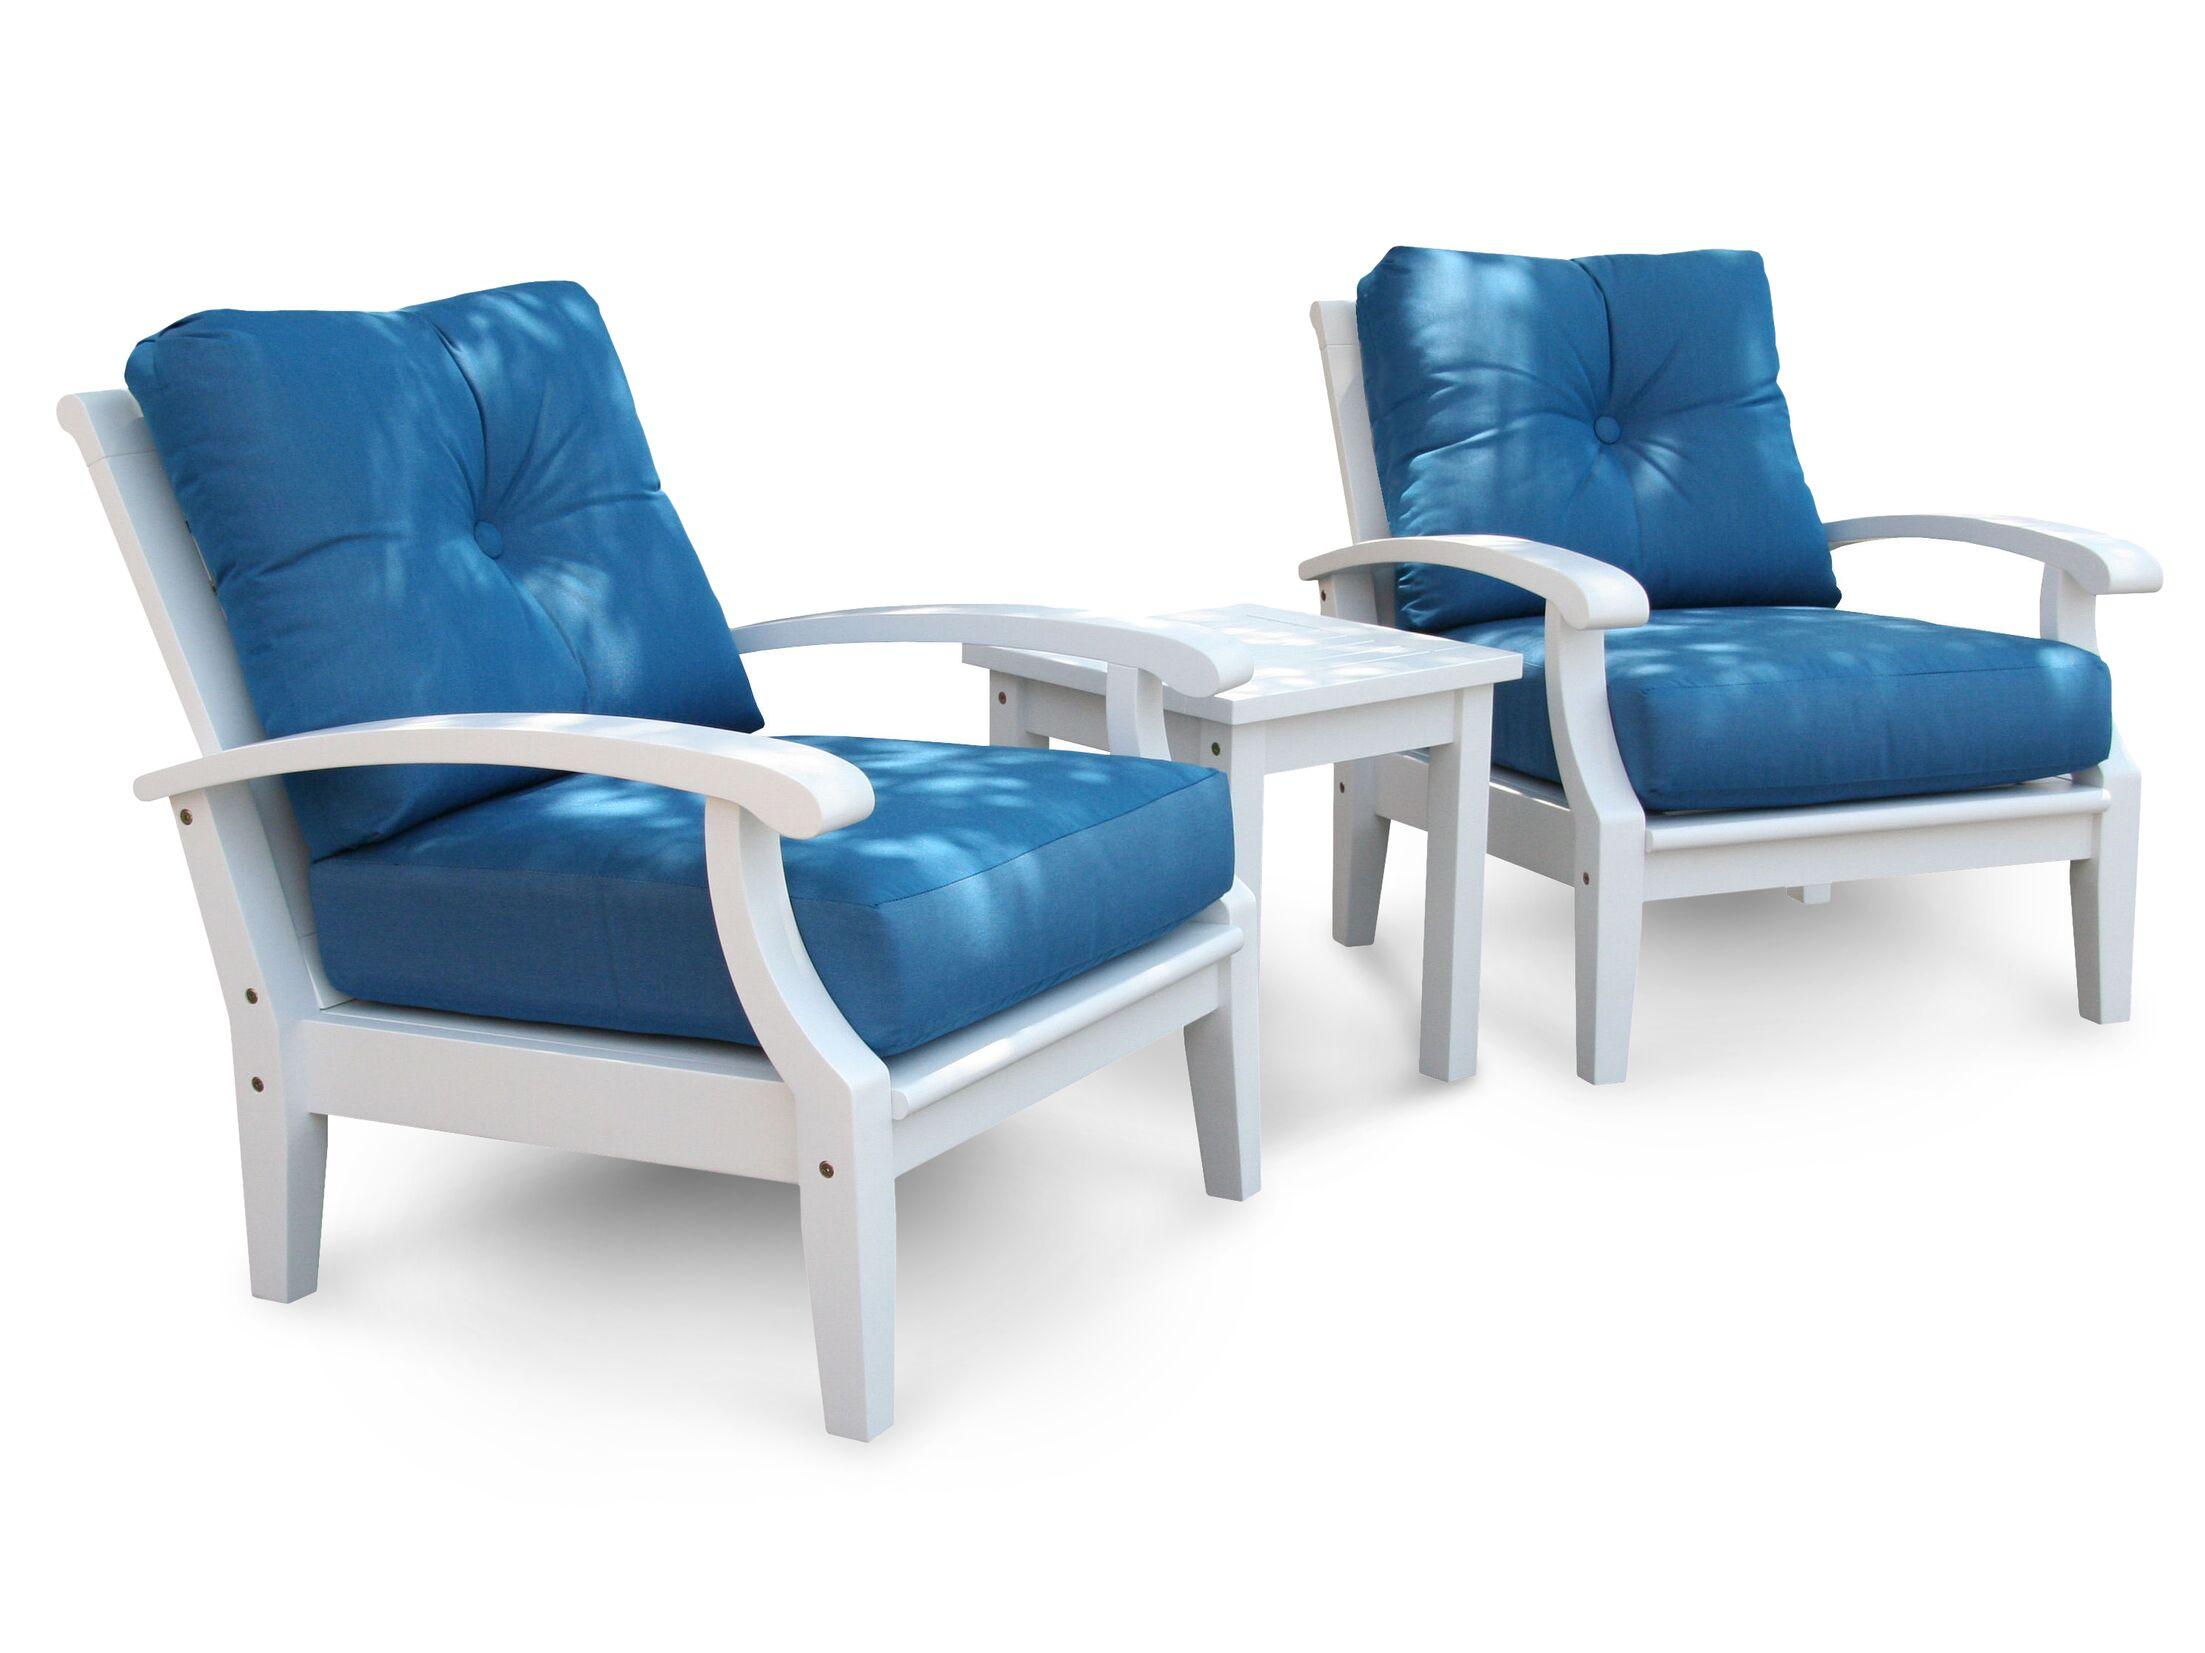 Cayman 2 Piece Sunbrella Conversation Set with Cushions Fabric: Stanton Lagoon